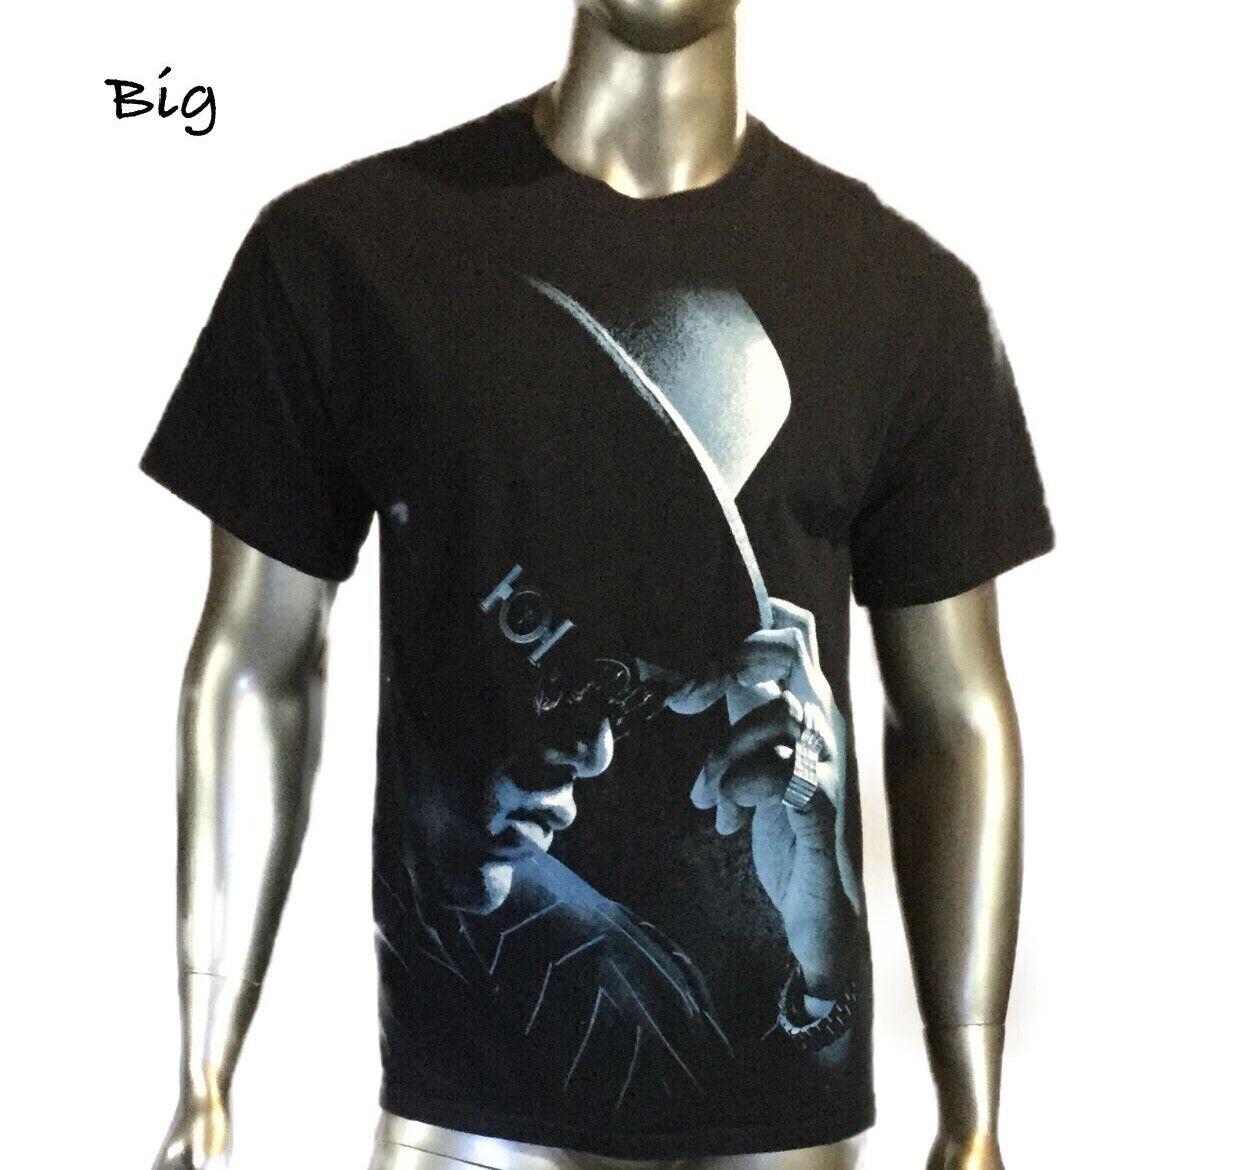 Vintage Notorious Big T Shirt Rap, TAGLIA L